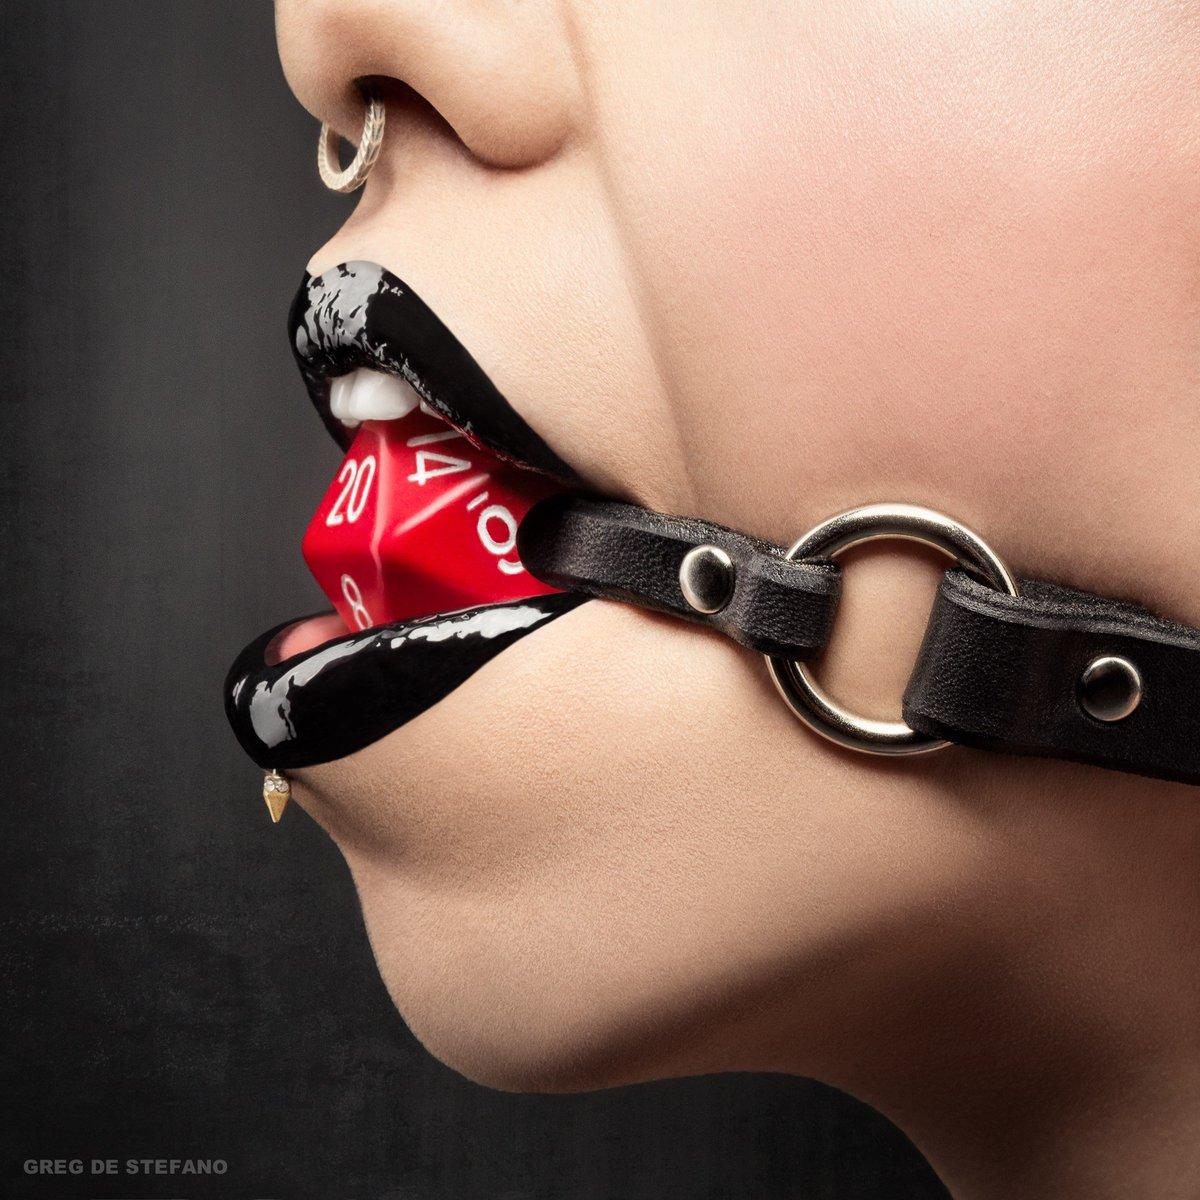 """Slave to the Dice"" #Tabletop #fetish #Dice #D20 Photo by @gdestefano #GregDeStefano MUA: Diana Knudsen. Model: Me https://t.co/rHLc7HmxBJ"